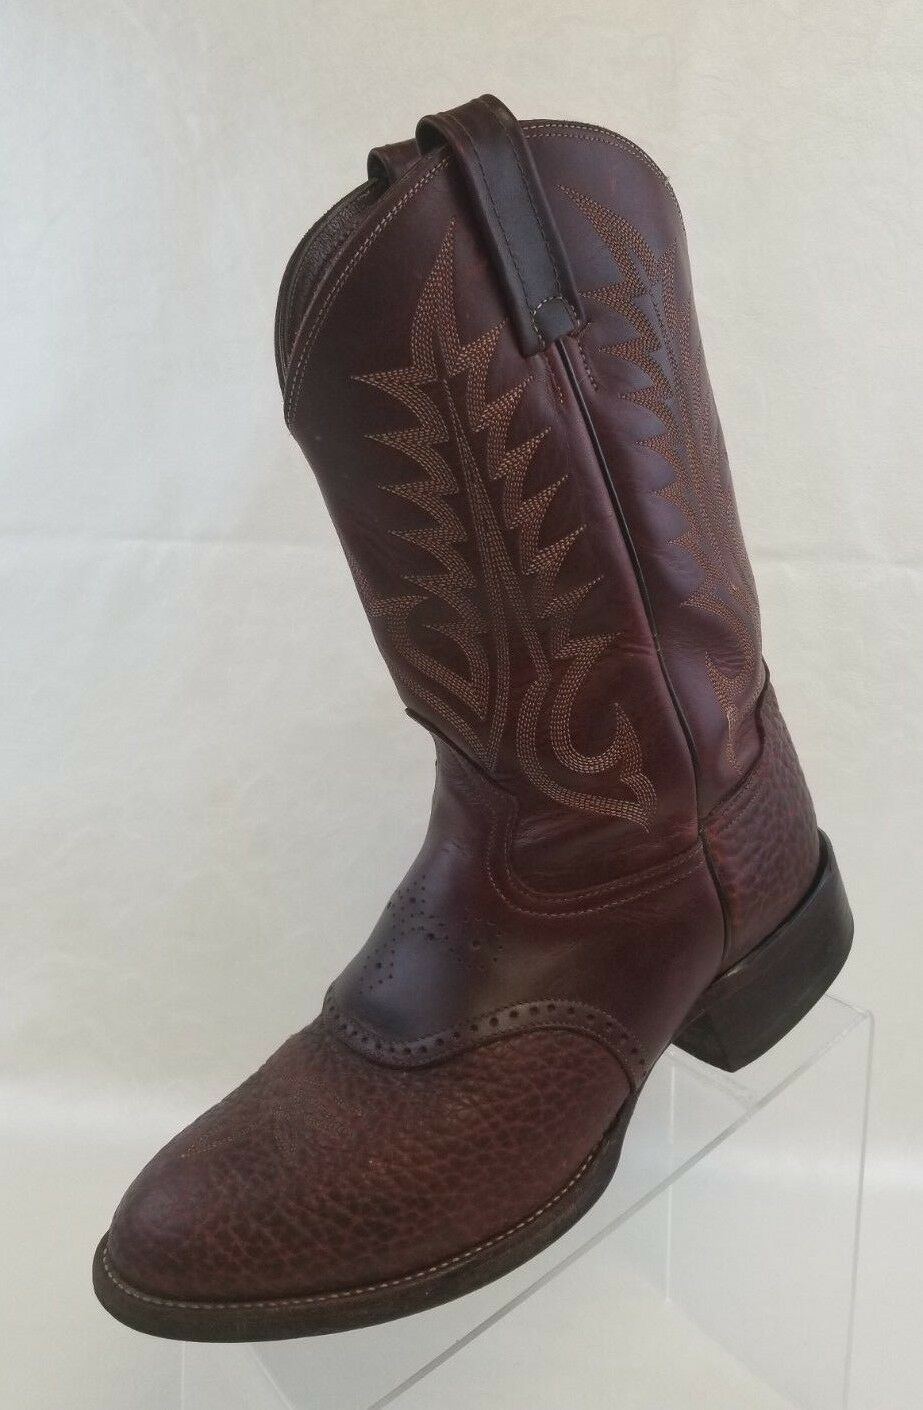 Tony Lama Western Cowboy Boots Mens Renegade Brown Bullhide Ropers Pull On Sz 9D